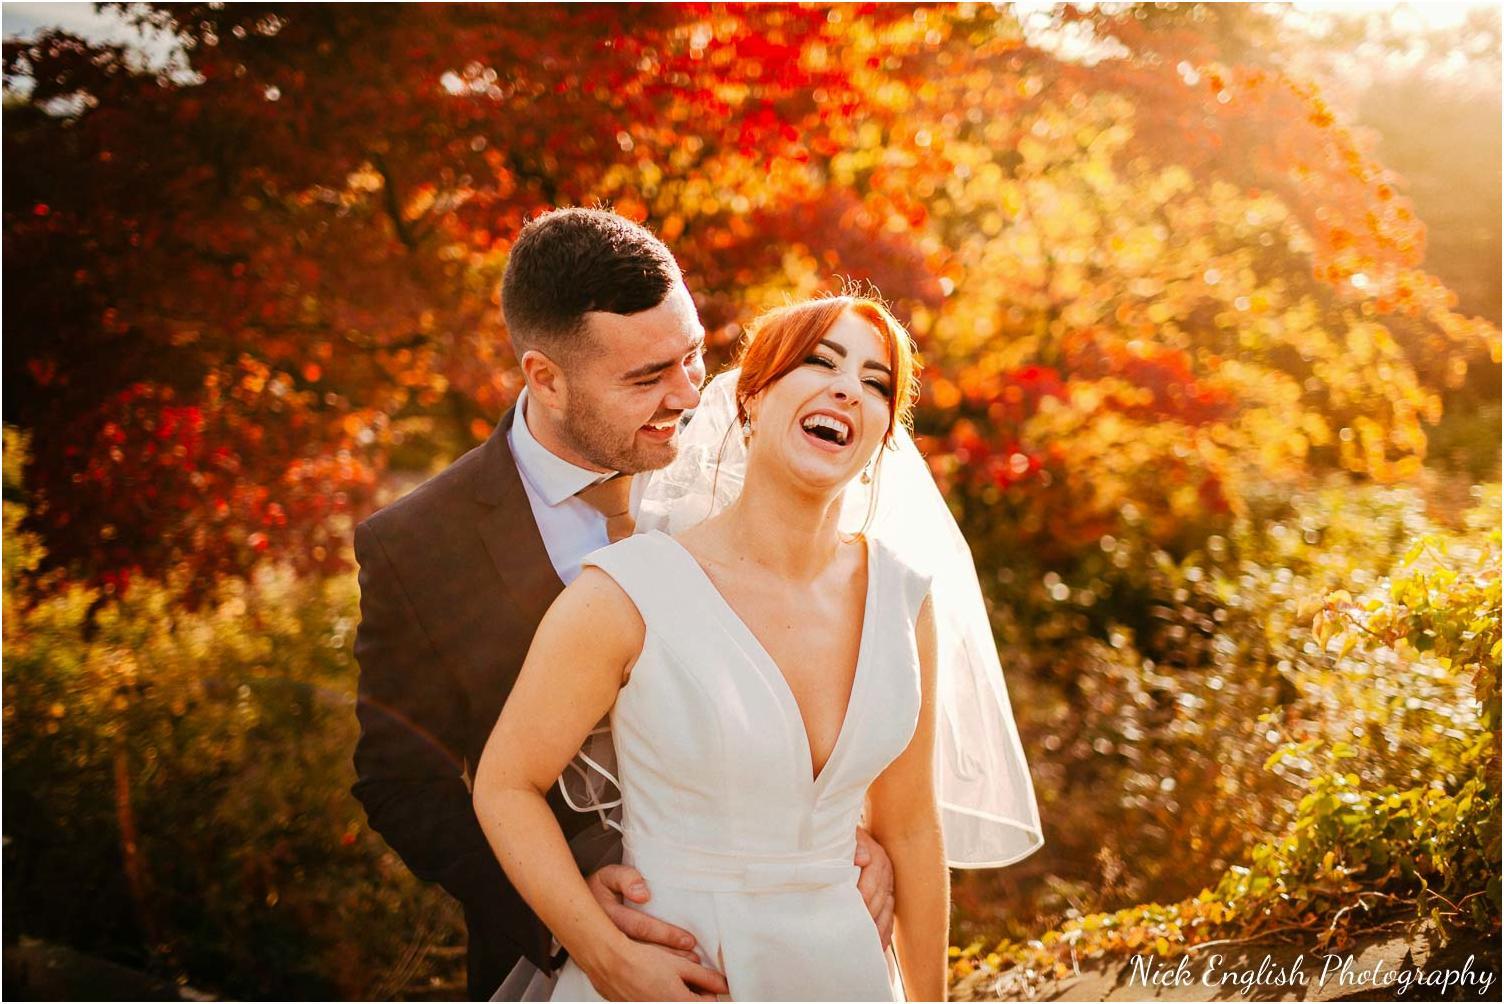 Lancashire_Wedding_Photographer-3.jpg